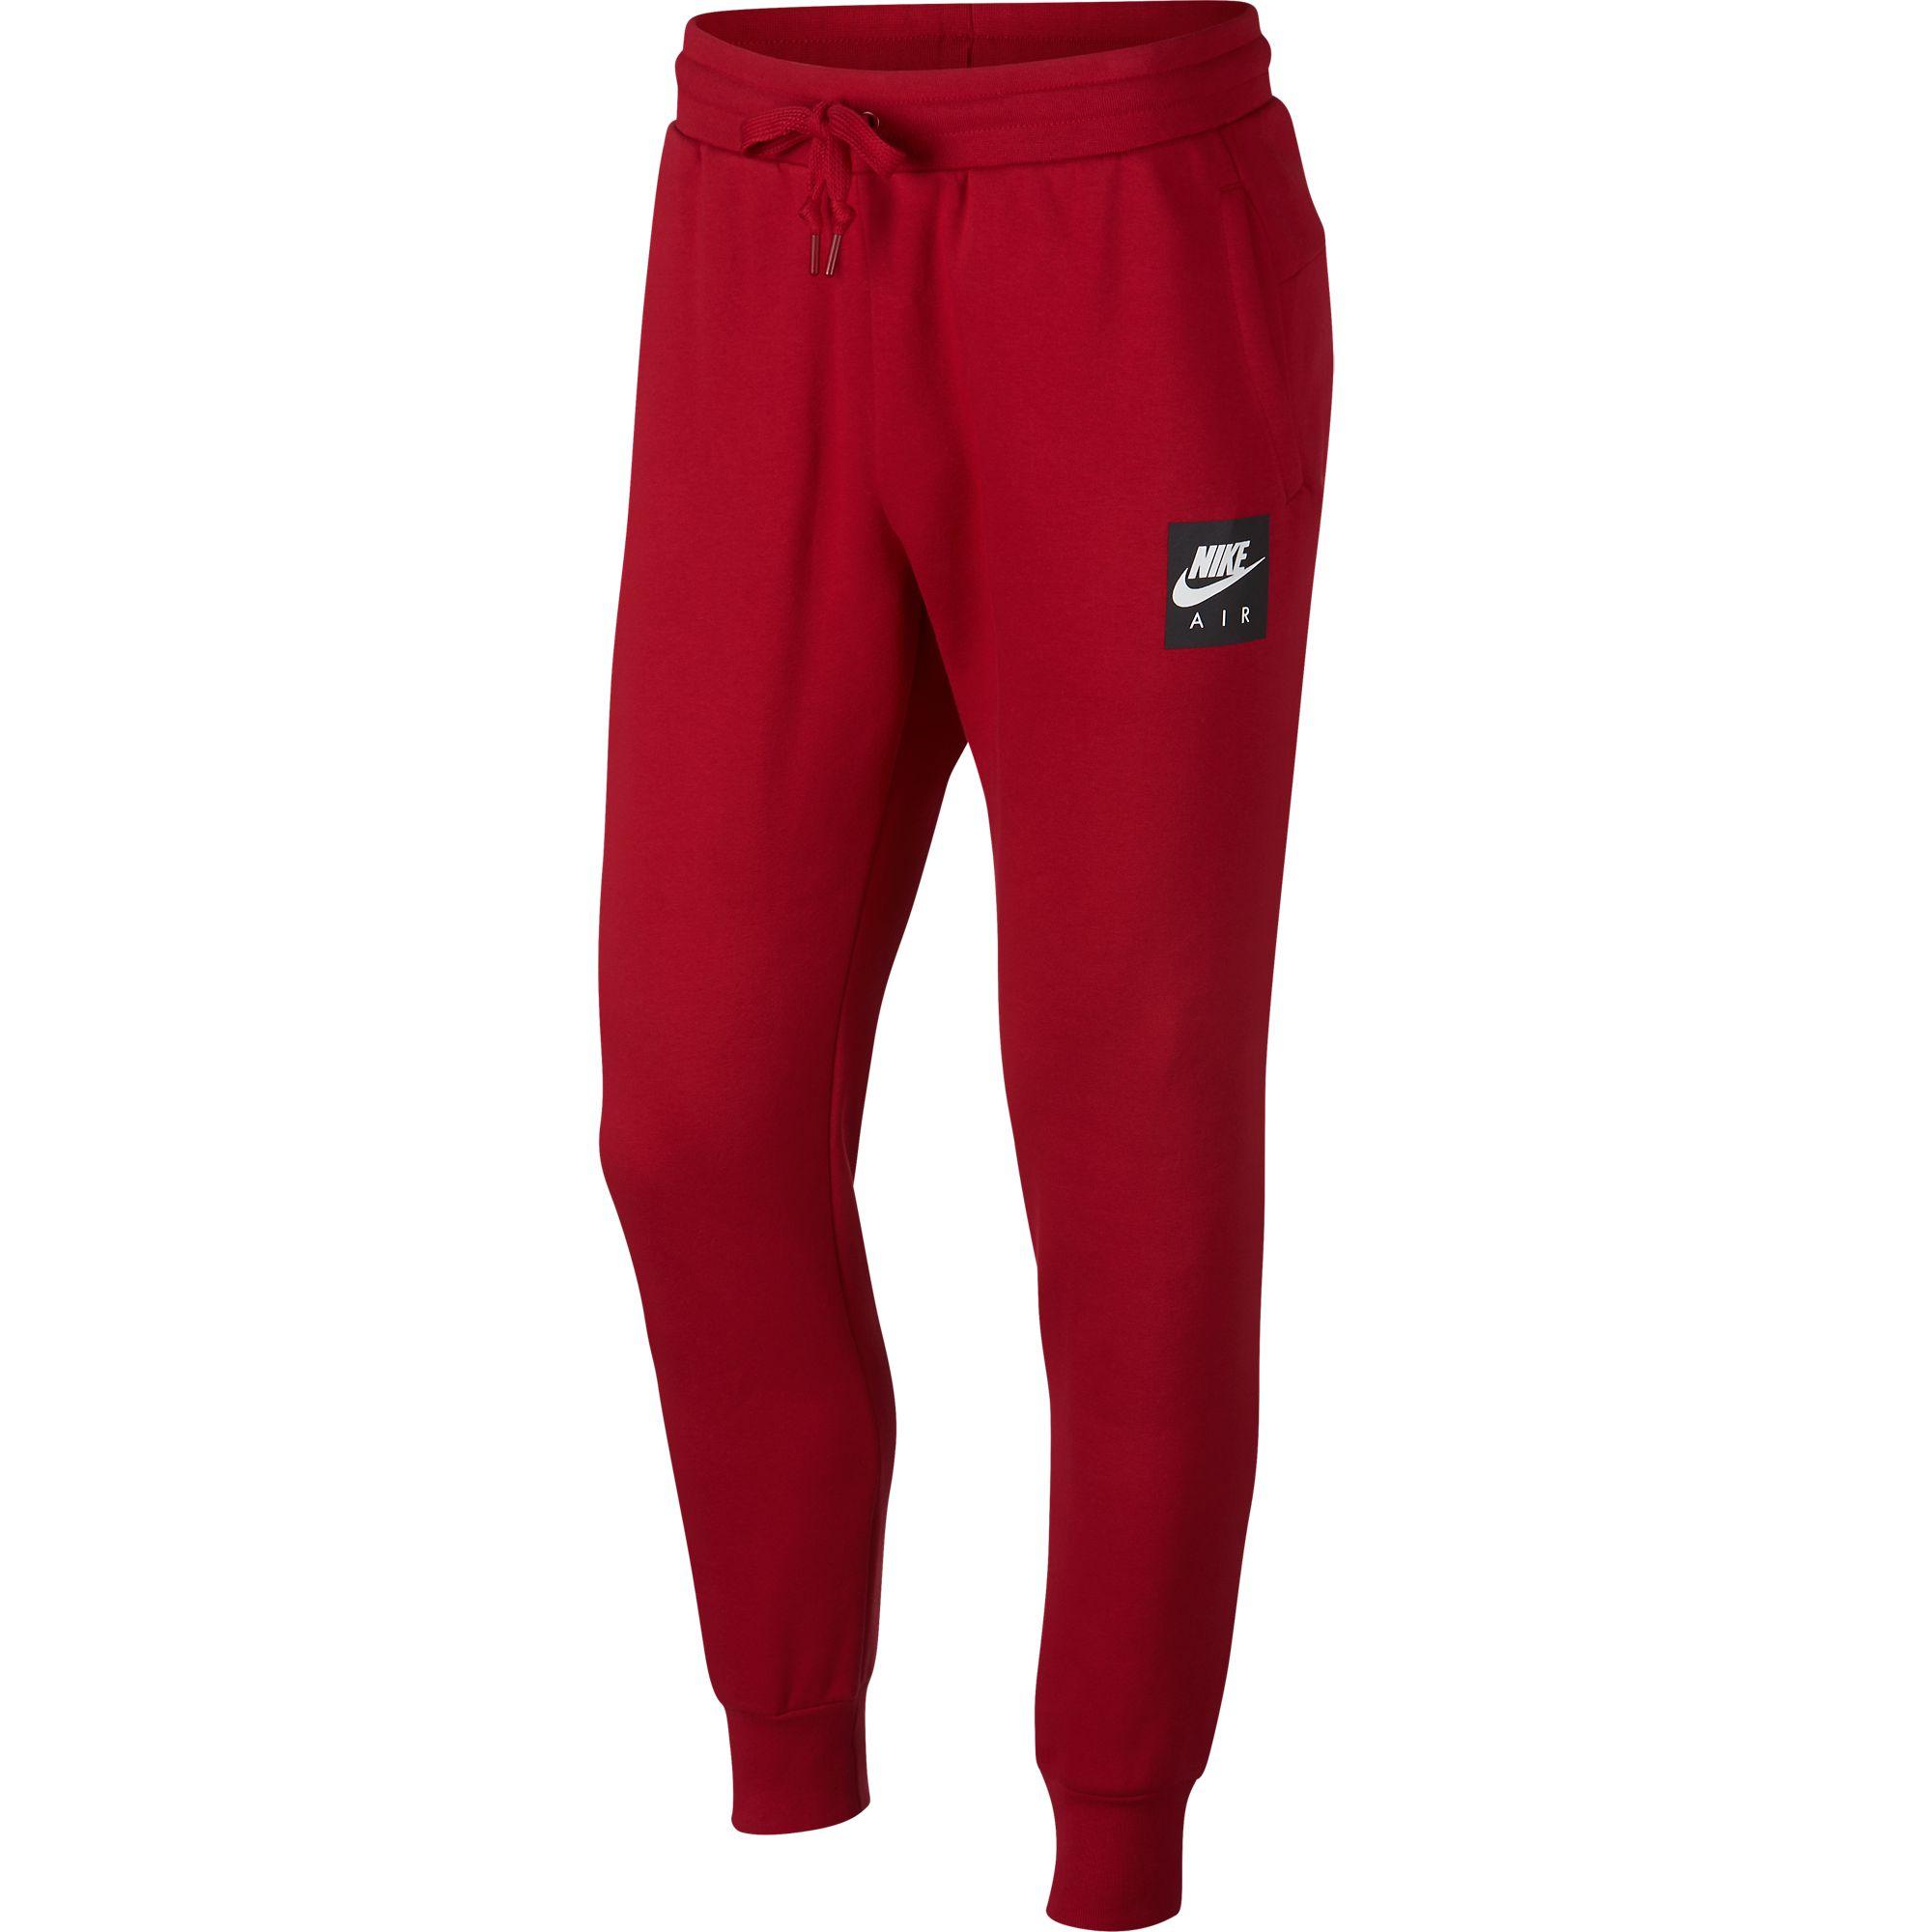 778120589 Details about Nike Sportswear Air Fleece Men's Sweat Pants Red/Black/White  928637-687